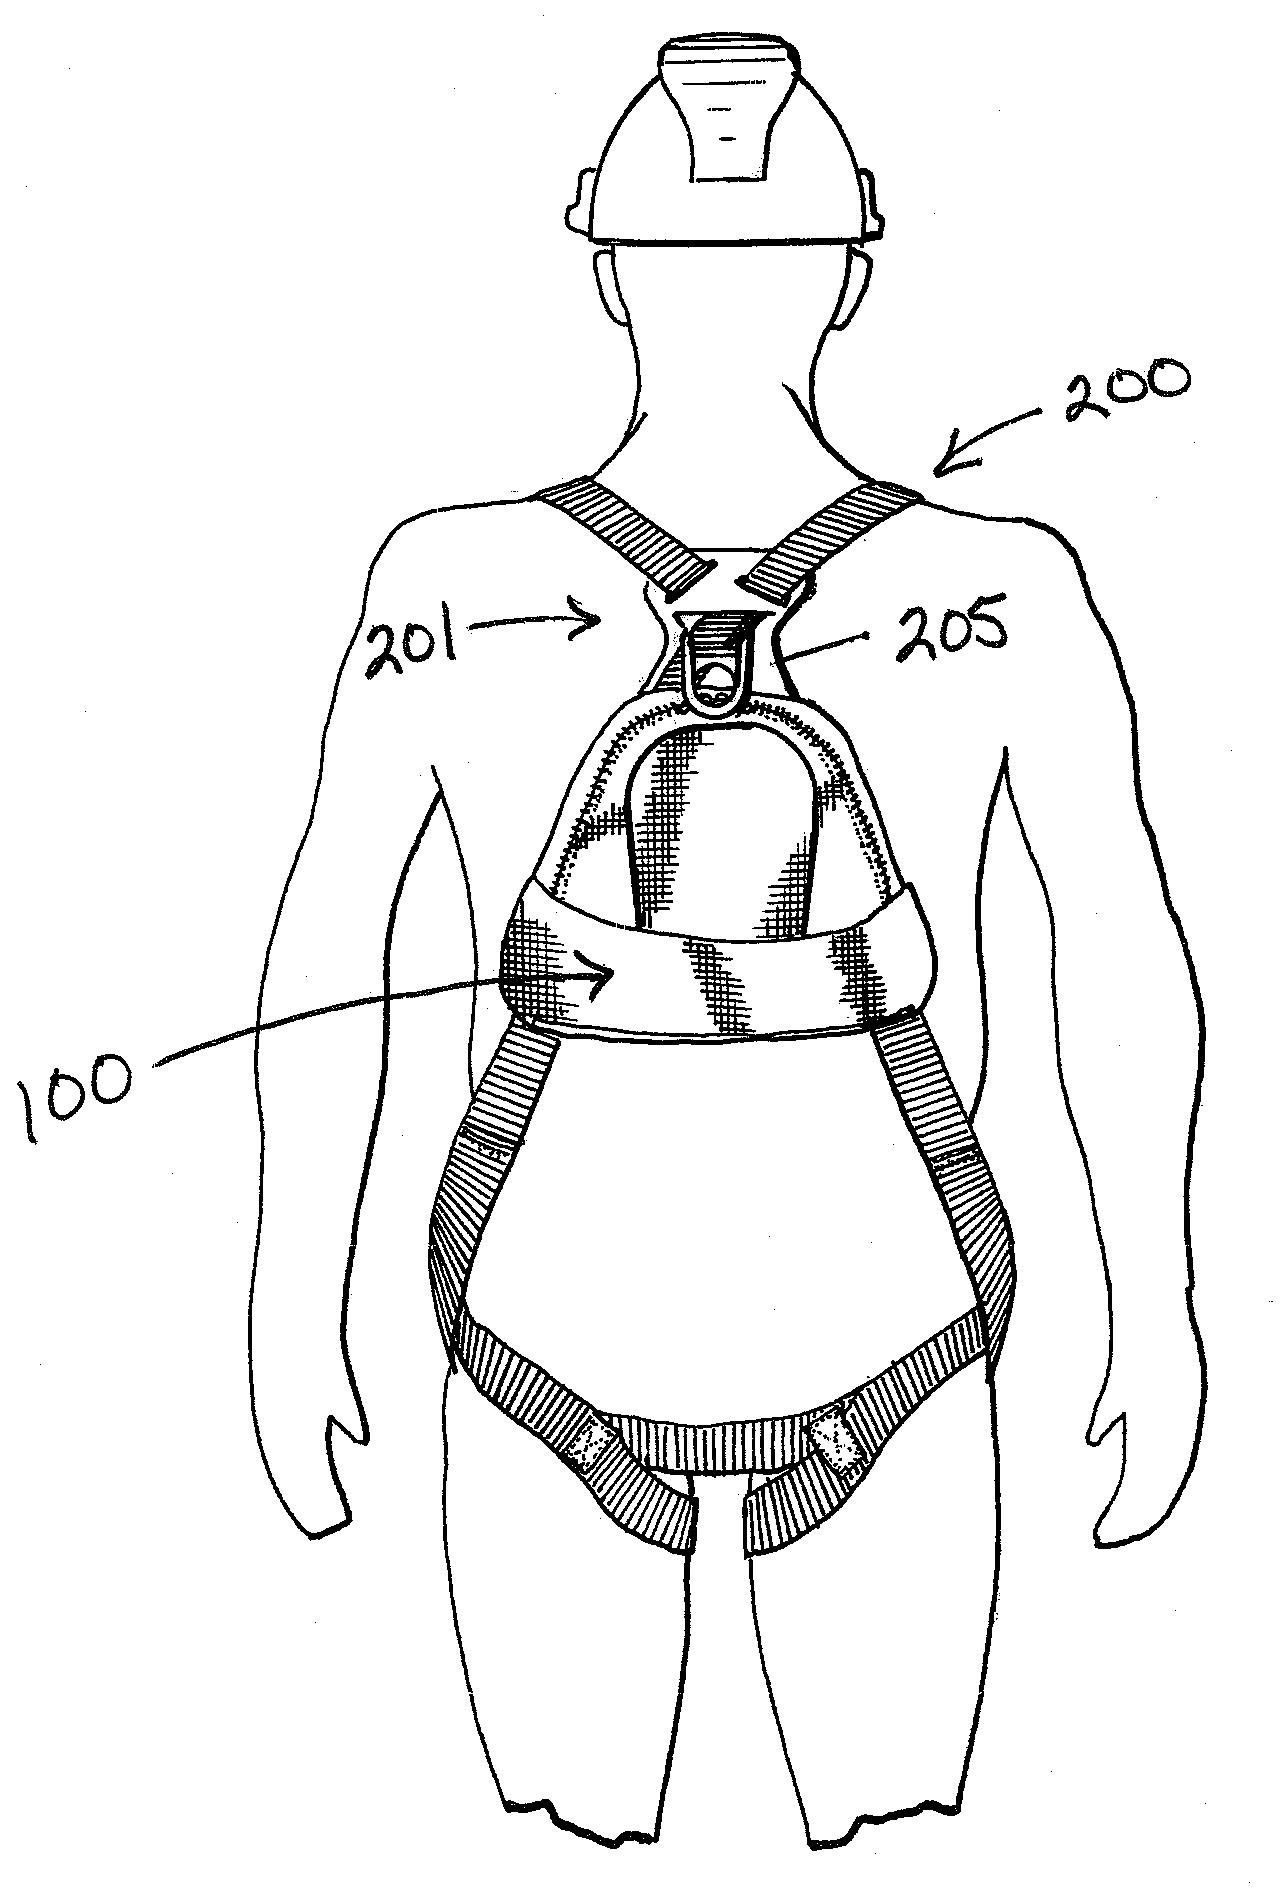 2004 acura tsx alarm wiring diagram